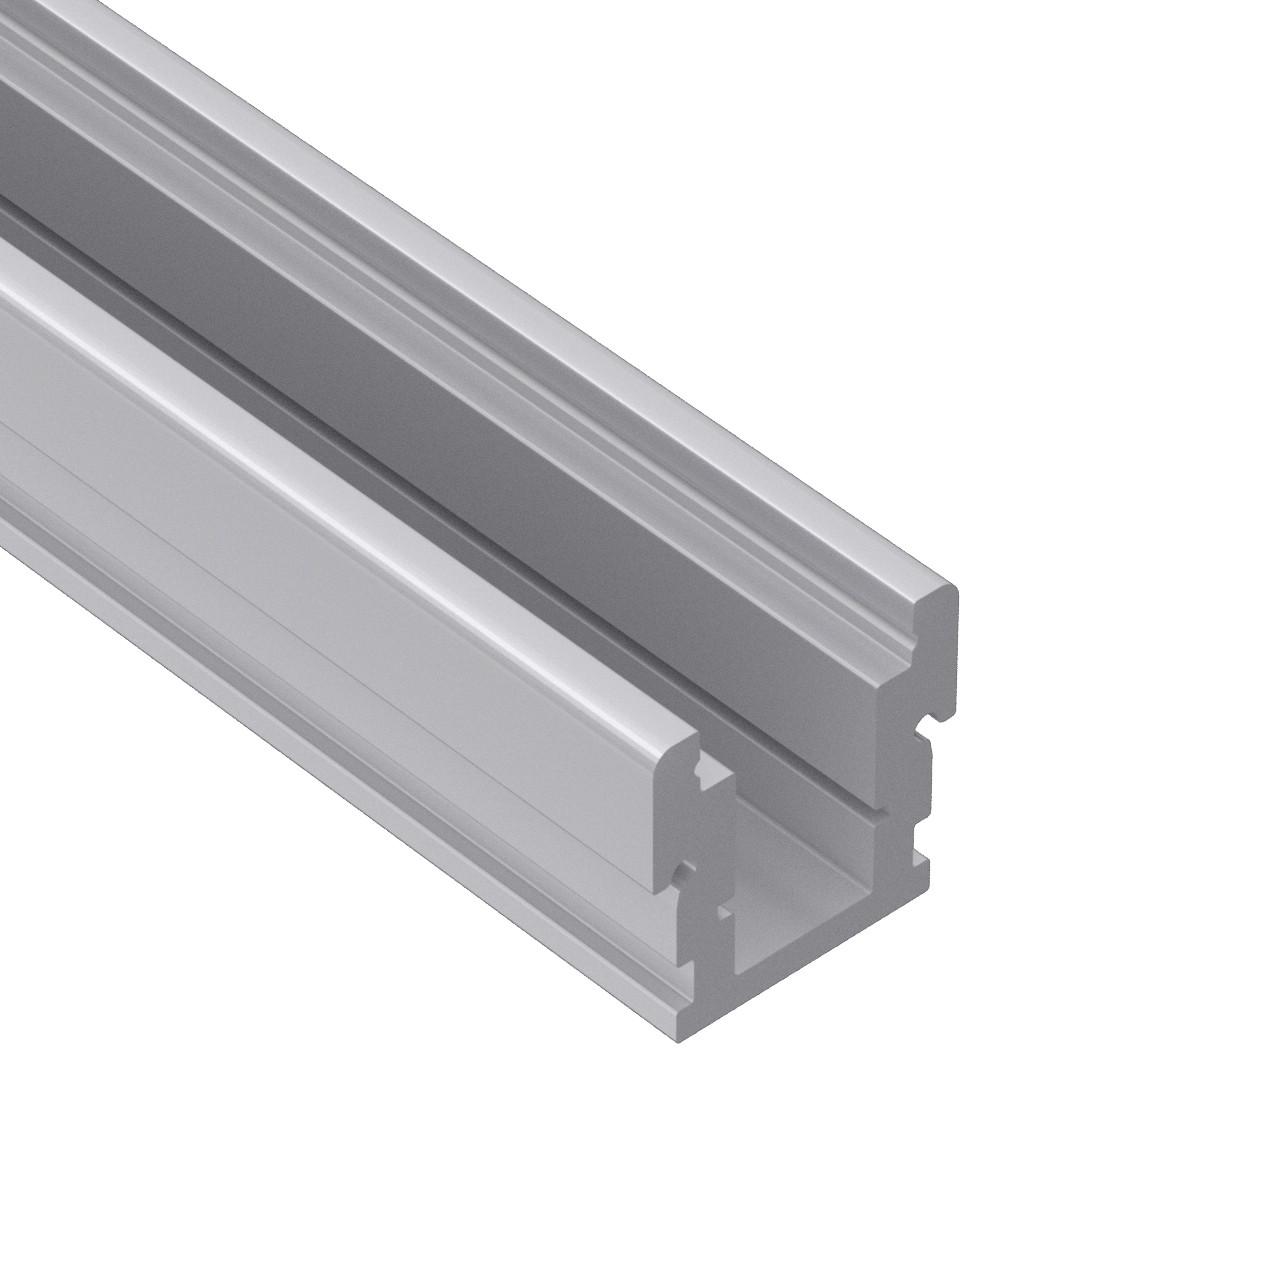 AF1 Floor IP67 Led Aluminum Profile